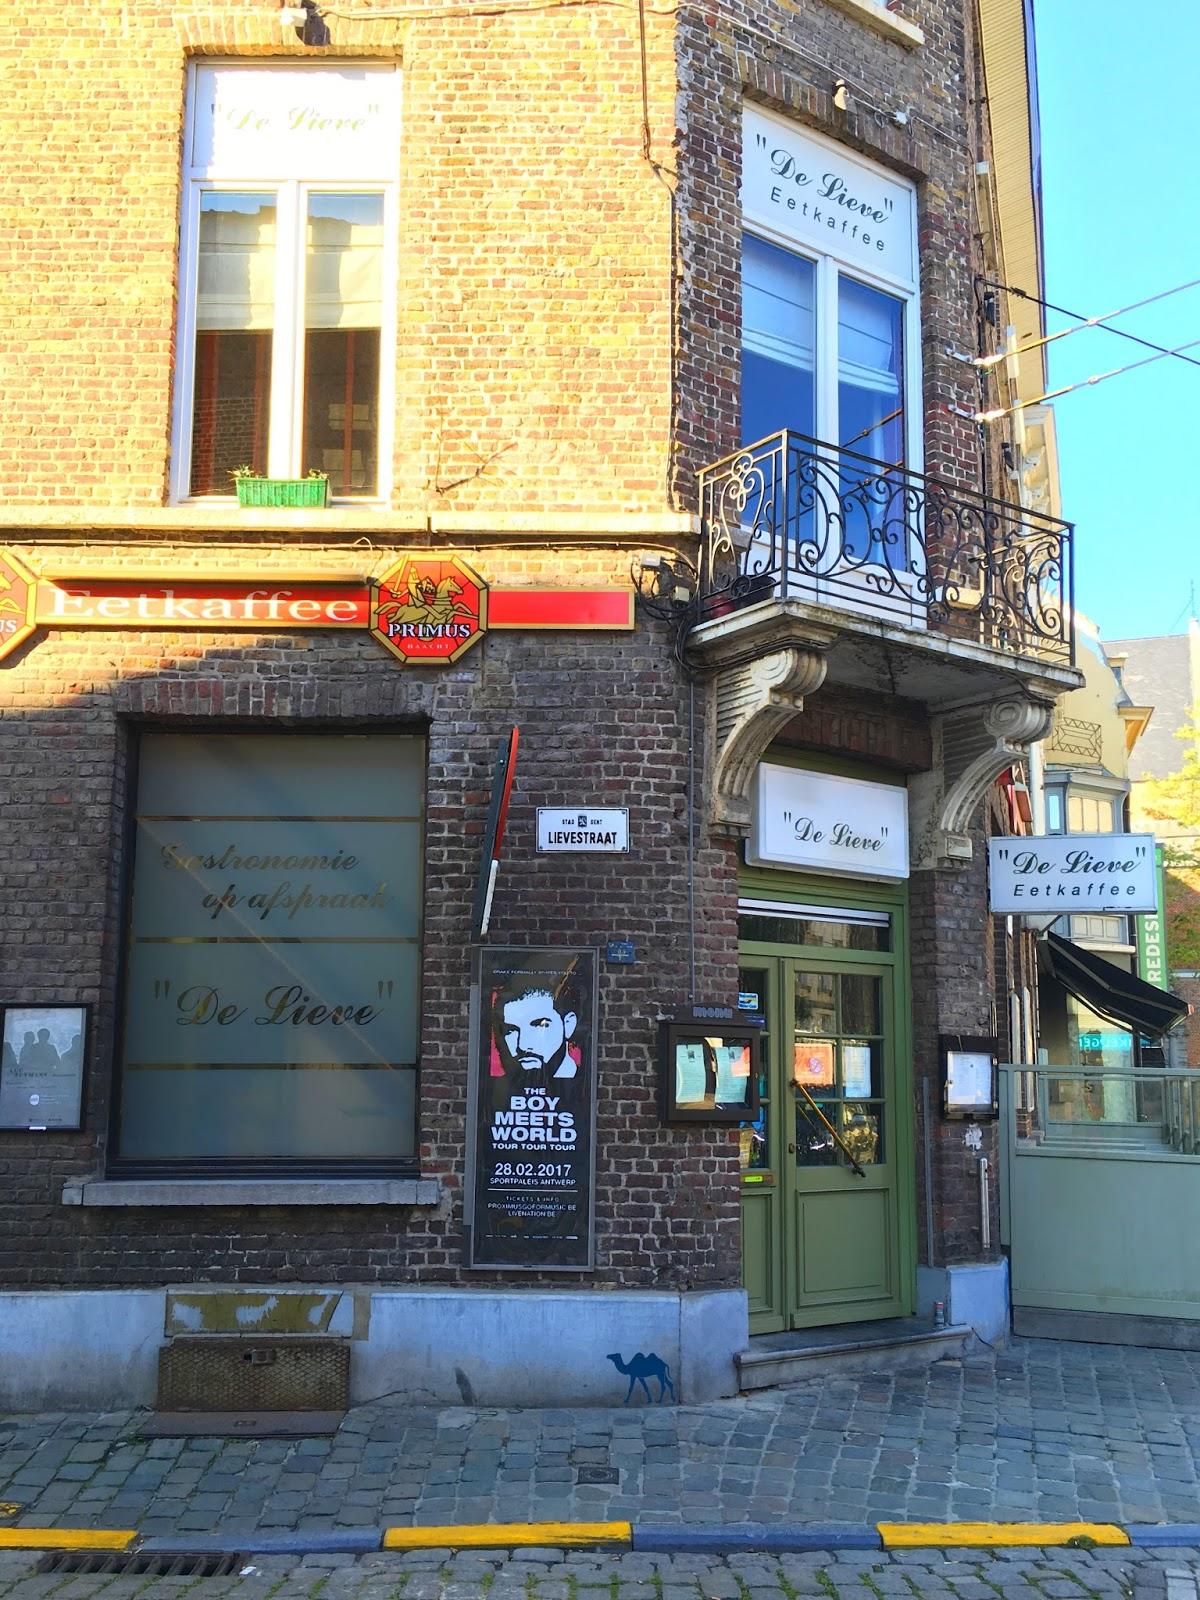 Le Chameau Bleu  - Blog Voyage Gand Belgique - De Lieve Restaurant à Gand Belgique Gent Adresse Food Gand